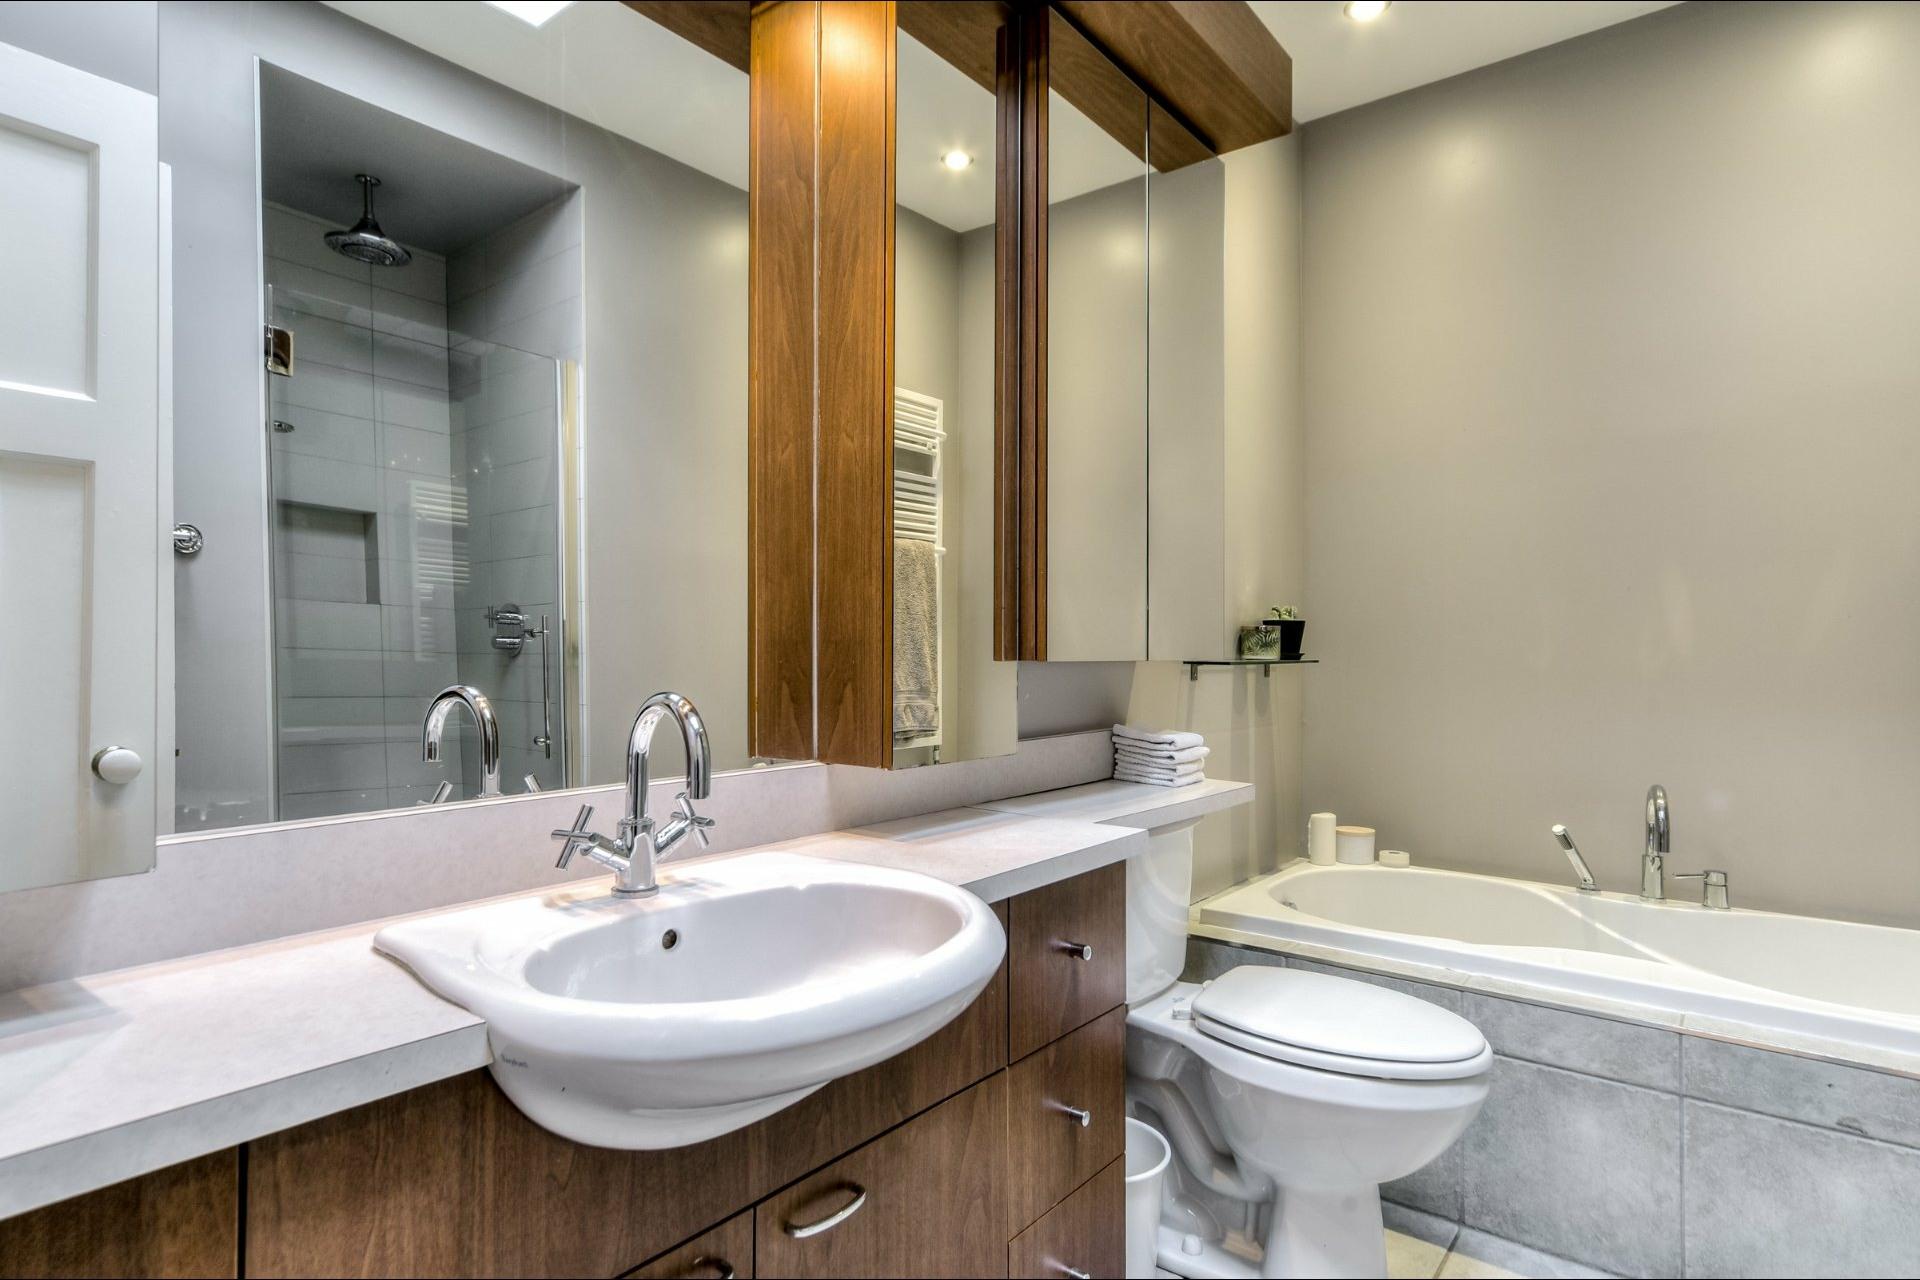 image 18 - House For sale Outremont Montréal  - 10 rooms